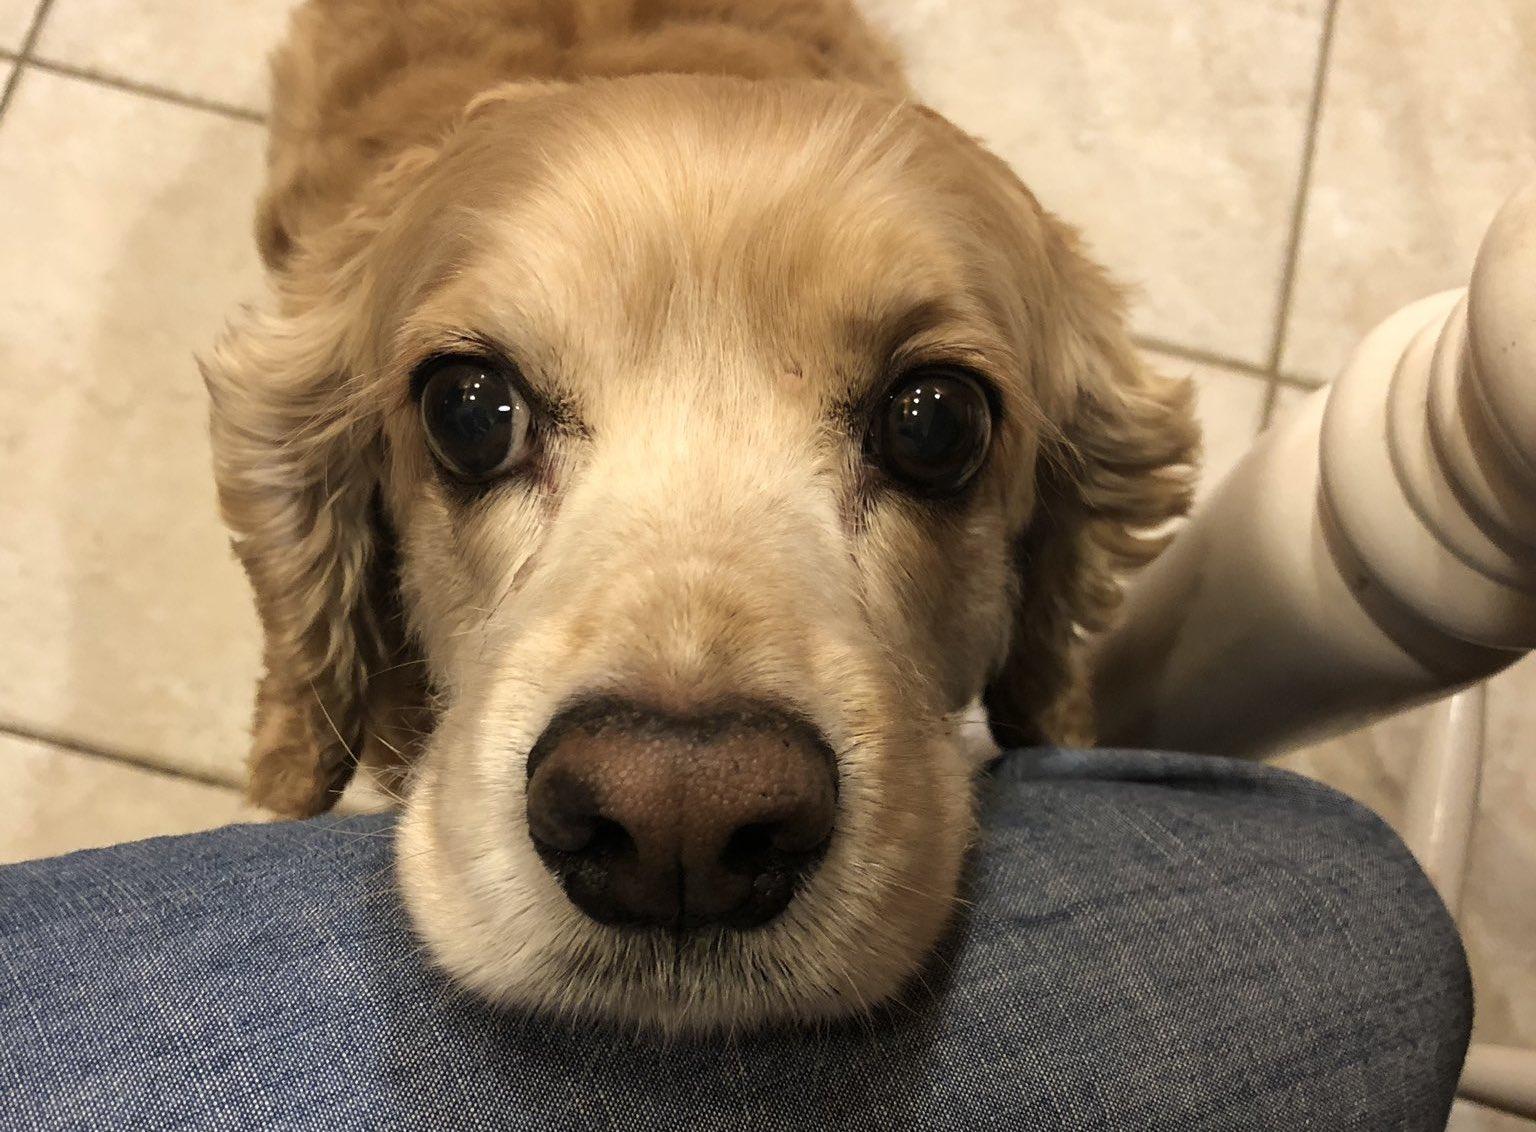 Puppy Eyes: Dogs' Secret People Manipulation Weapon